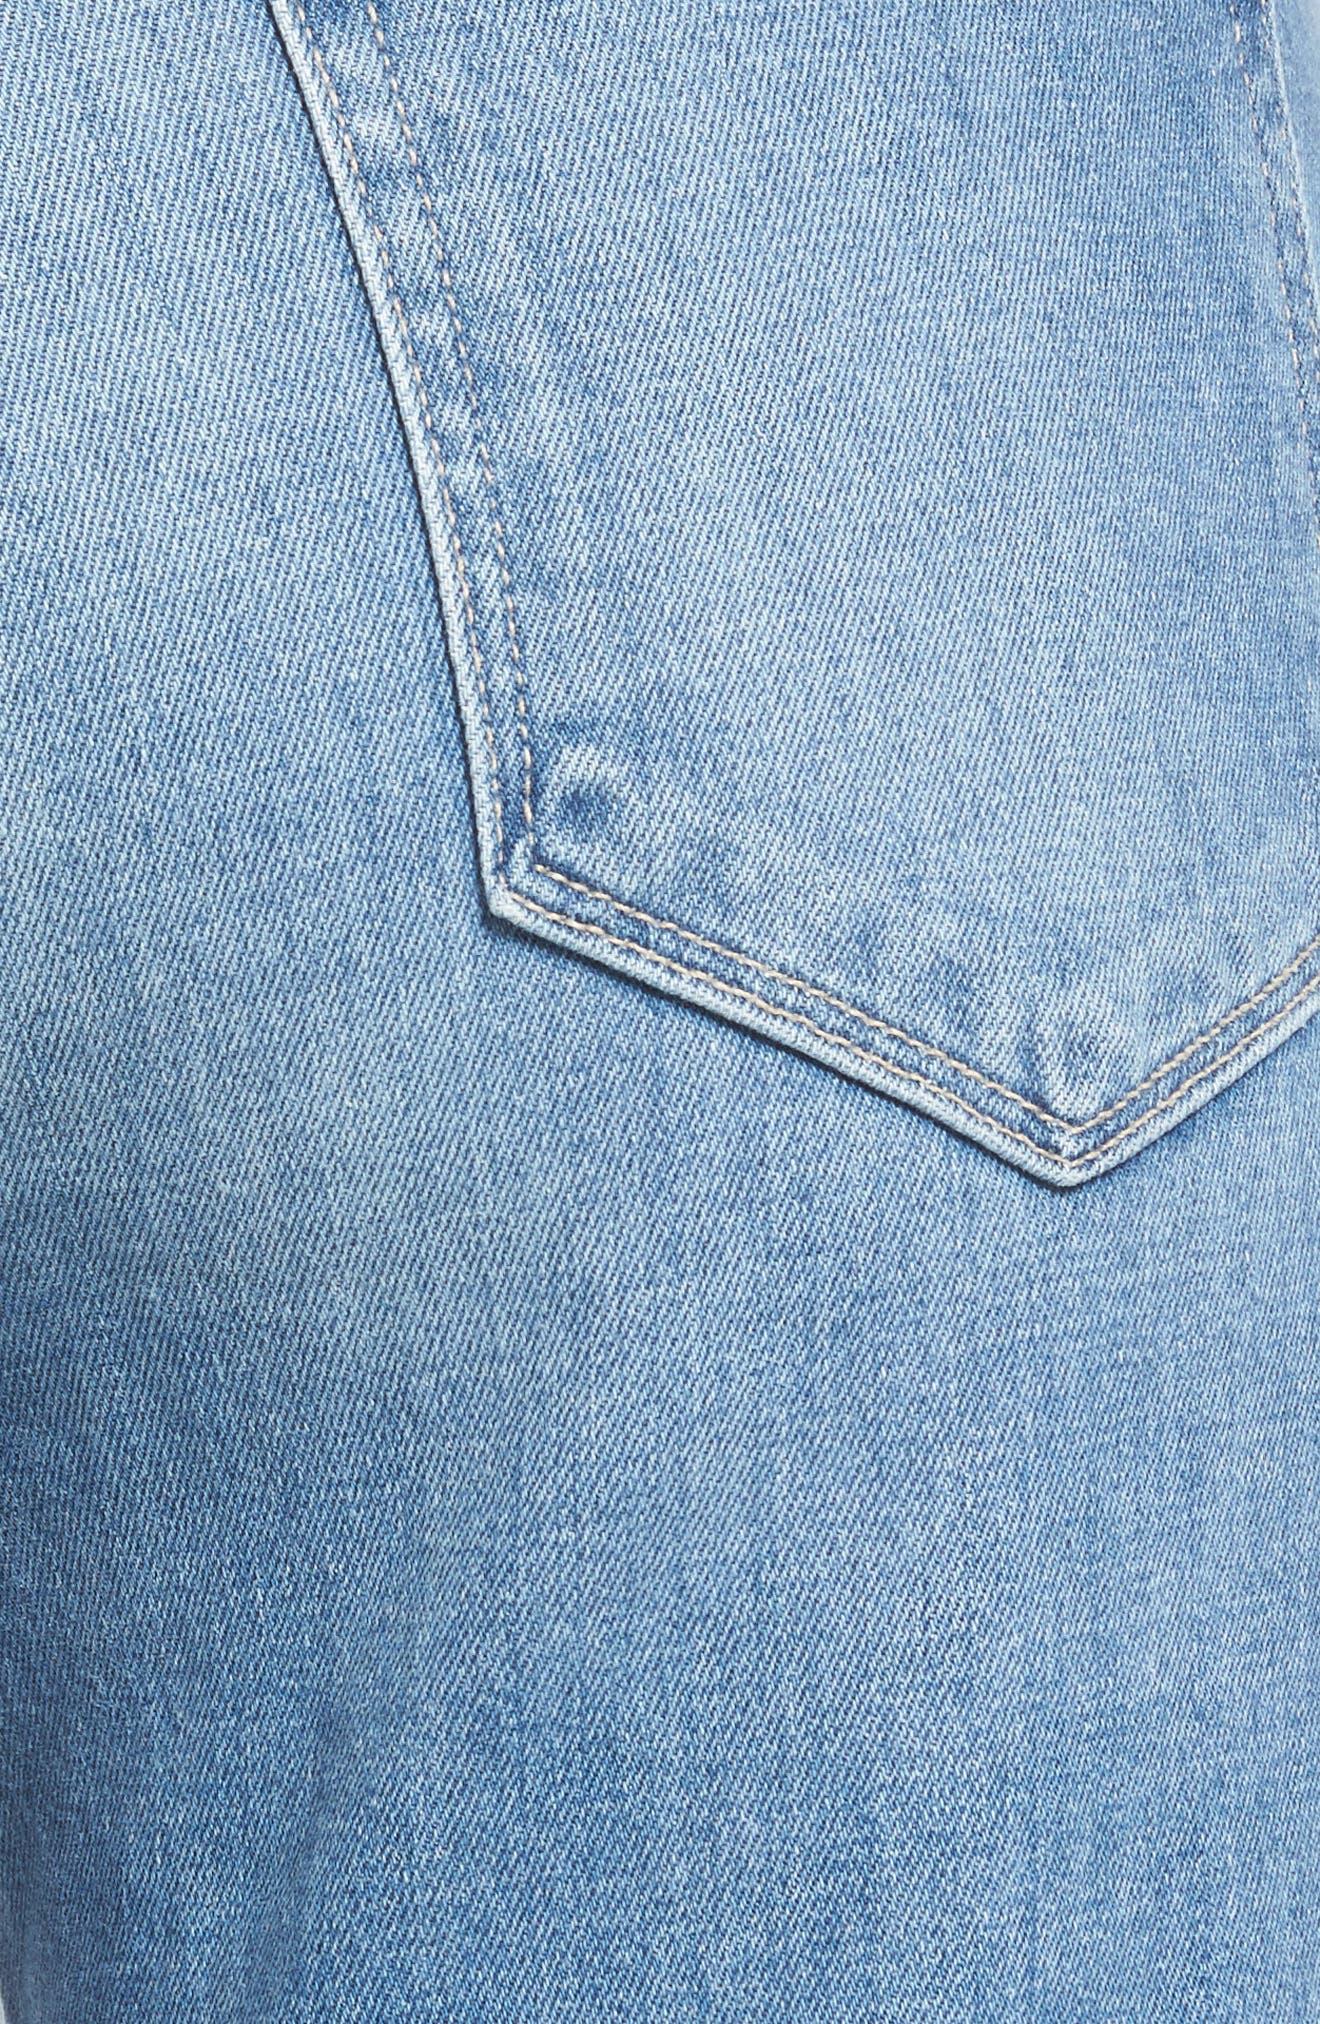 Sarah High Waist Crop Straight Leg Jeans,                             Alternate thumbnail 6, color,                             400